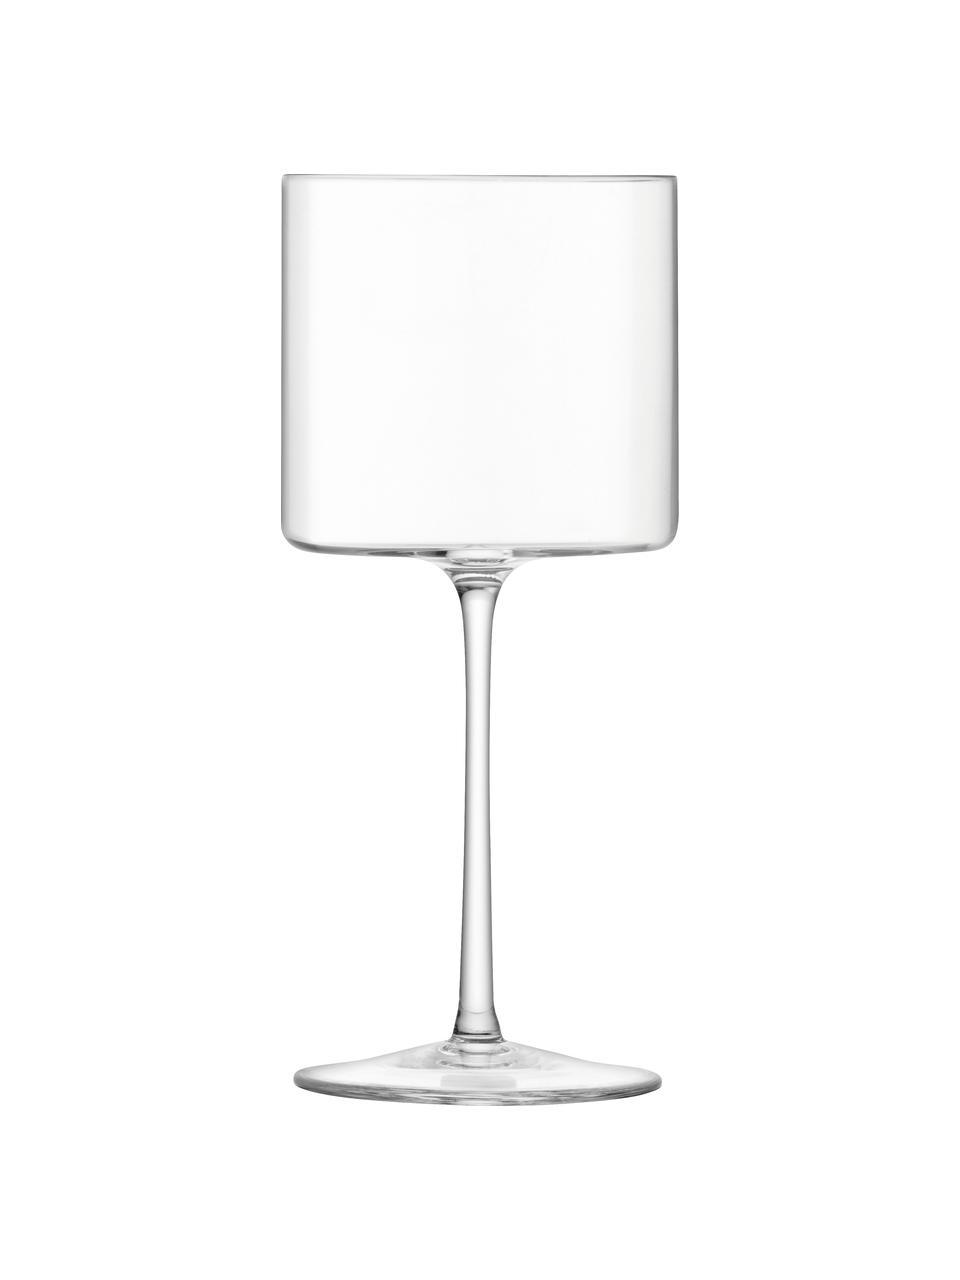 Bicchiere da vino rosso Otis 4 pz, Vetro, Trasparente, Ø 8 x Alt. 19 cm